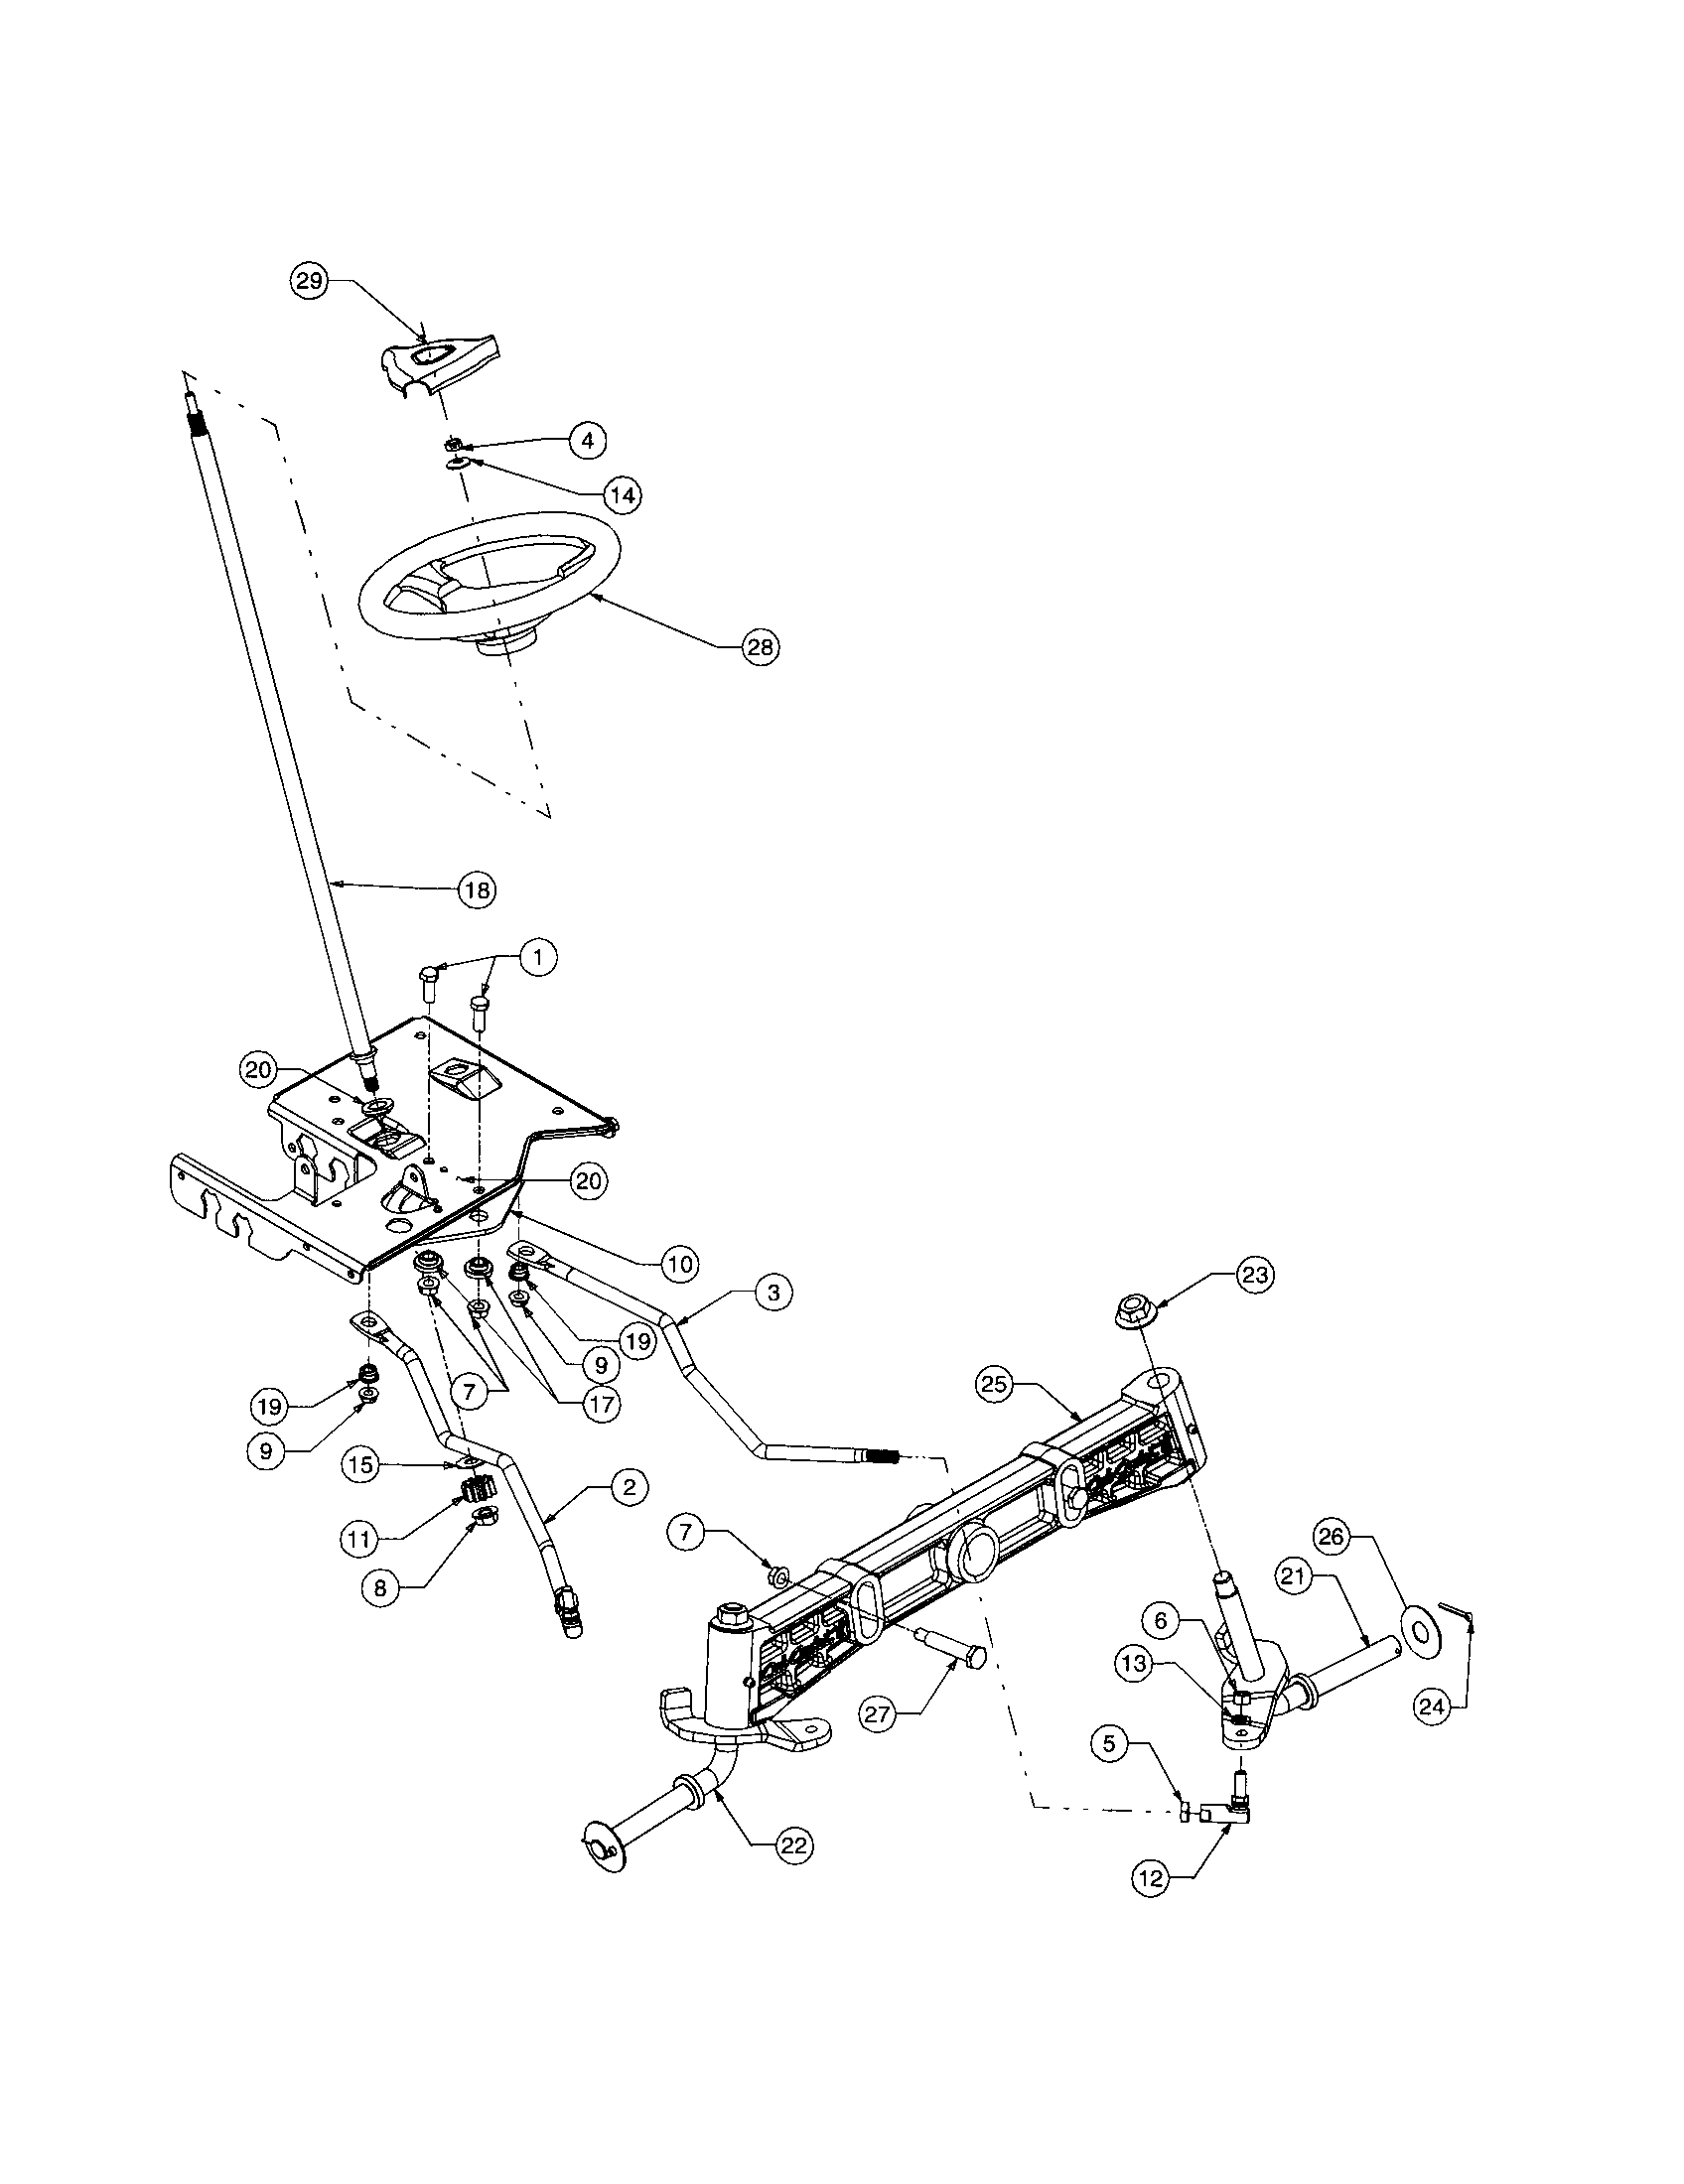 Cub-Cadet model 1515 lawn, tractor genuine parts